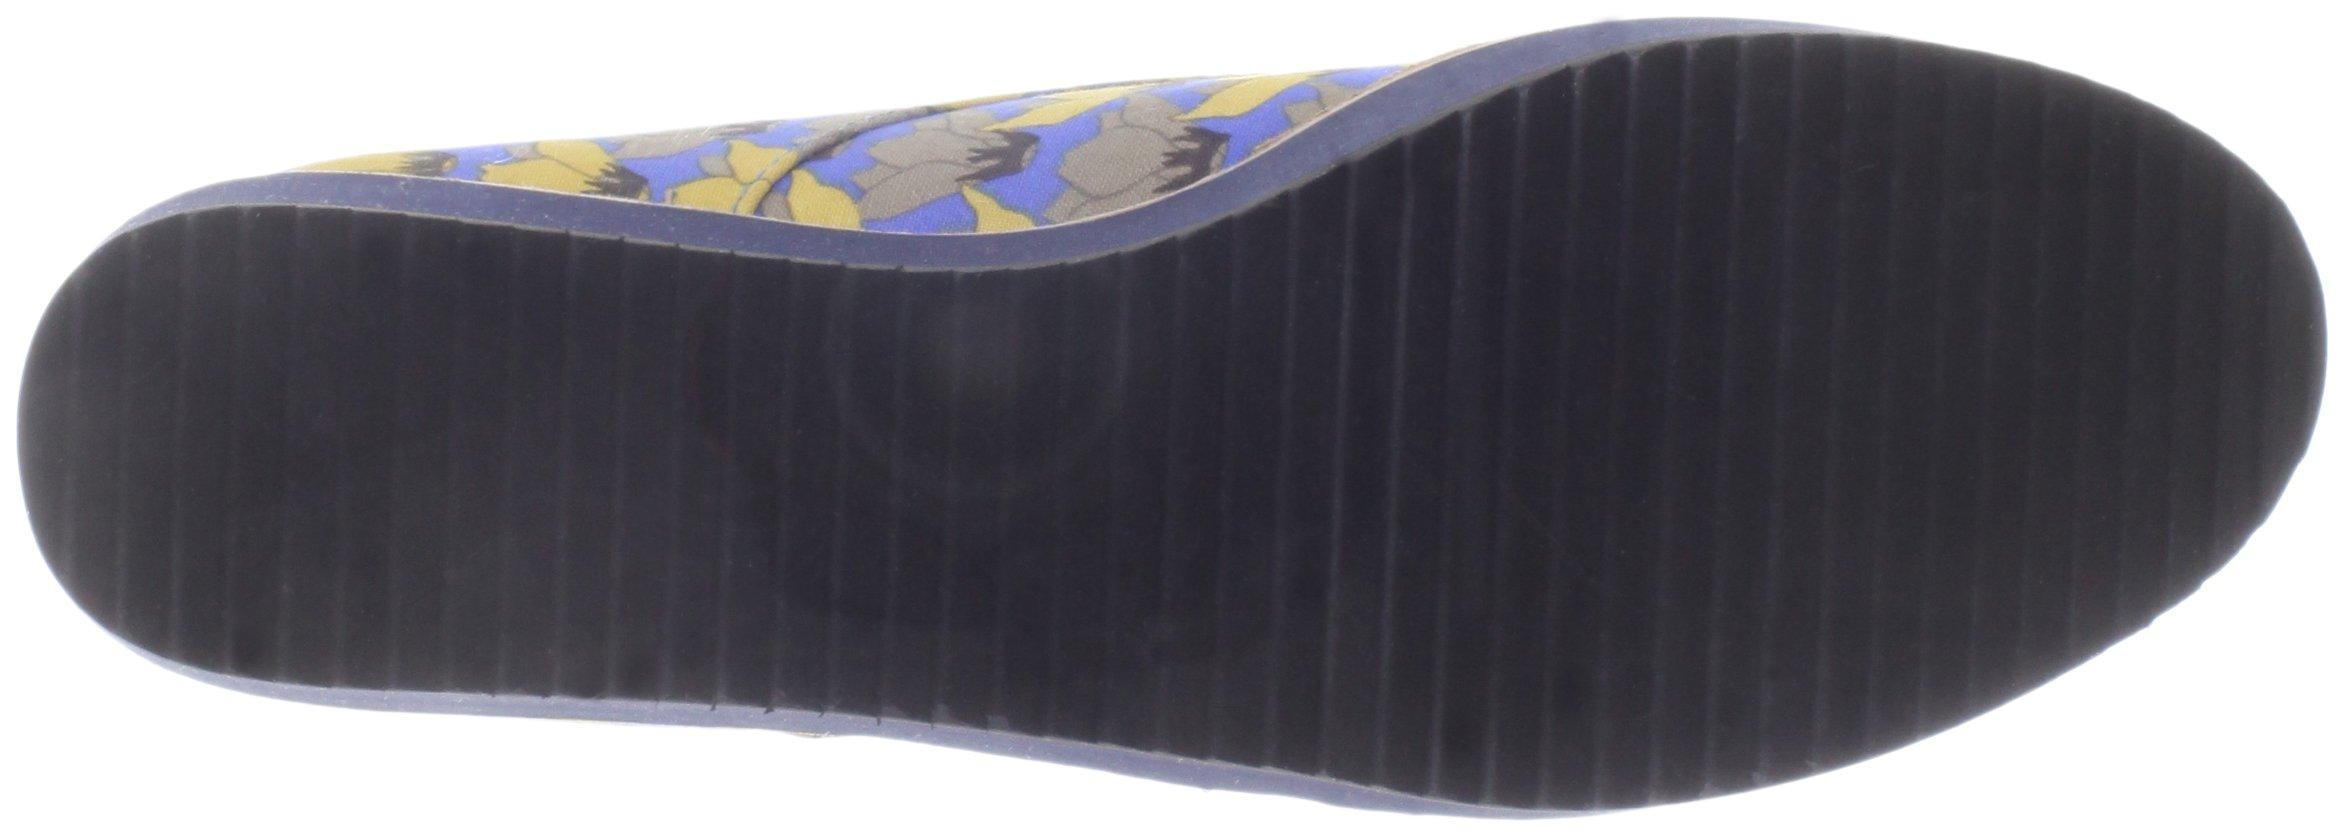 Bass Loves Rachel Antonoff Women's Fleur Loafer, Blue Floral, 6 M US by Bass Loves Rachel Antonoff (Image #3)